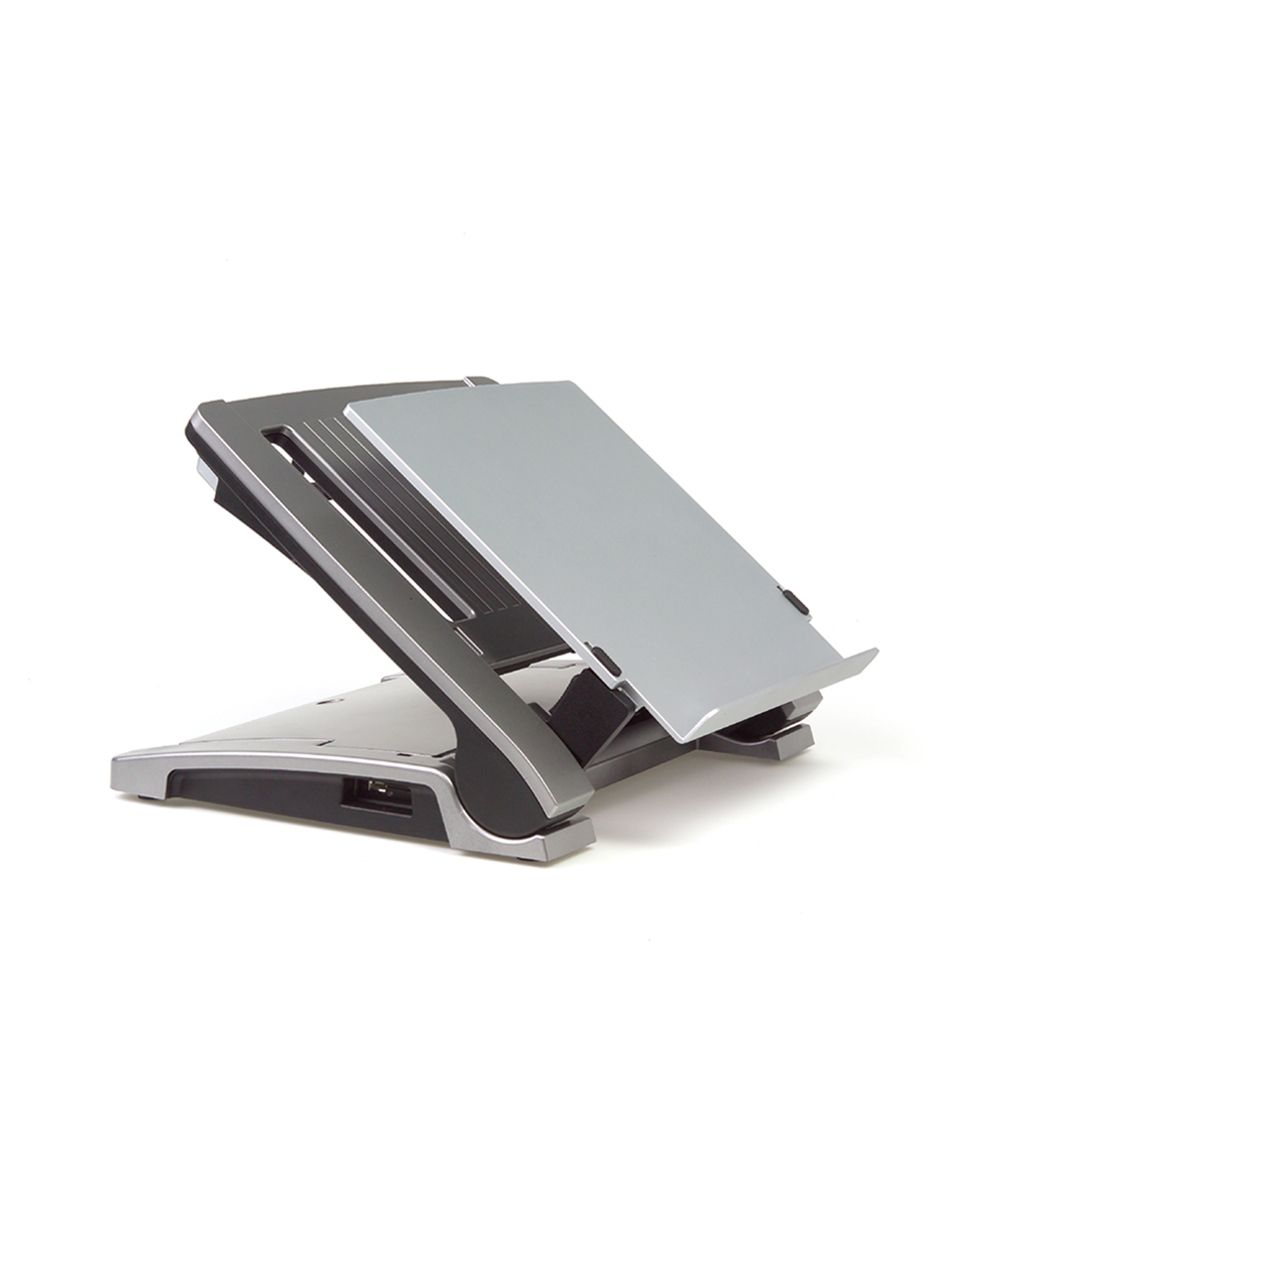 Ergo-T 340 laptophouder Dicht